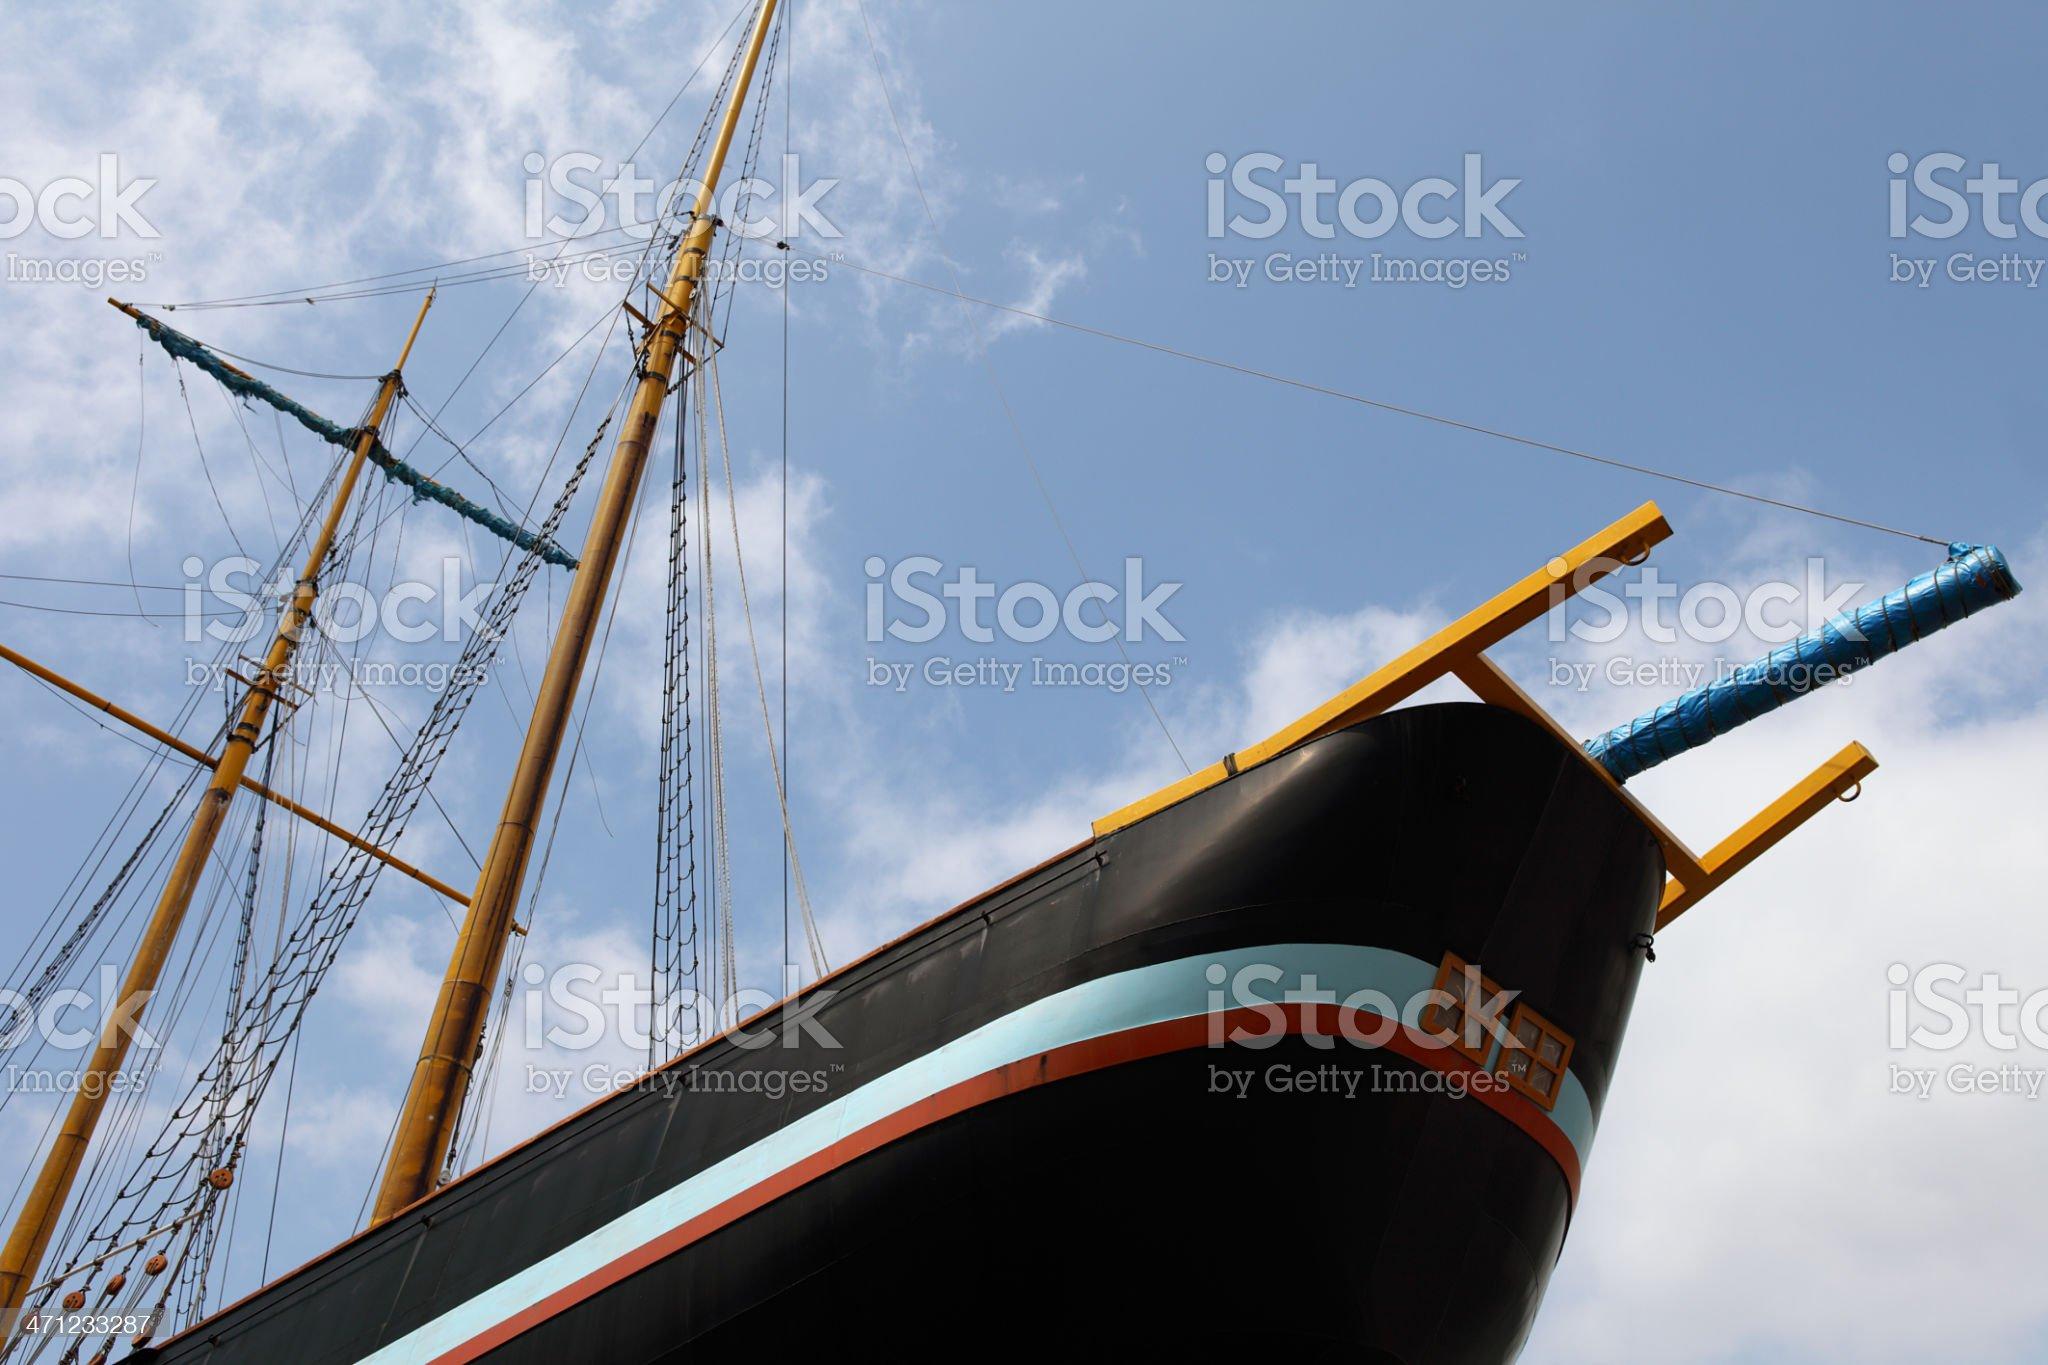 Japanese old warship royalty-free stock photo